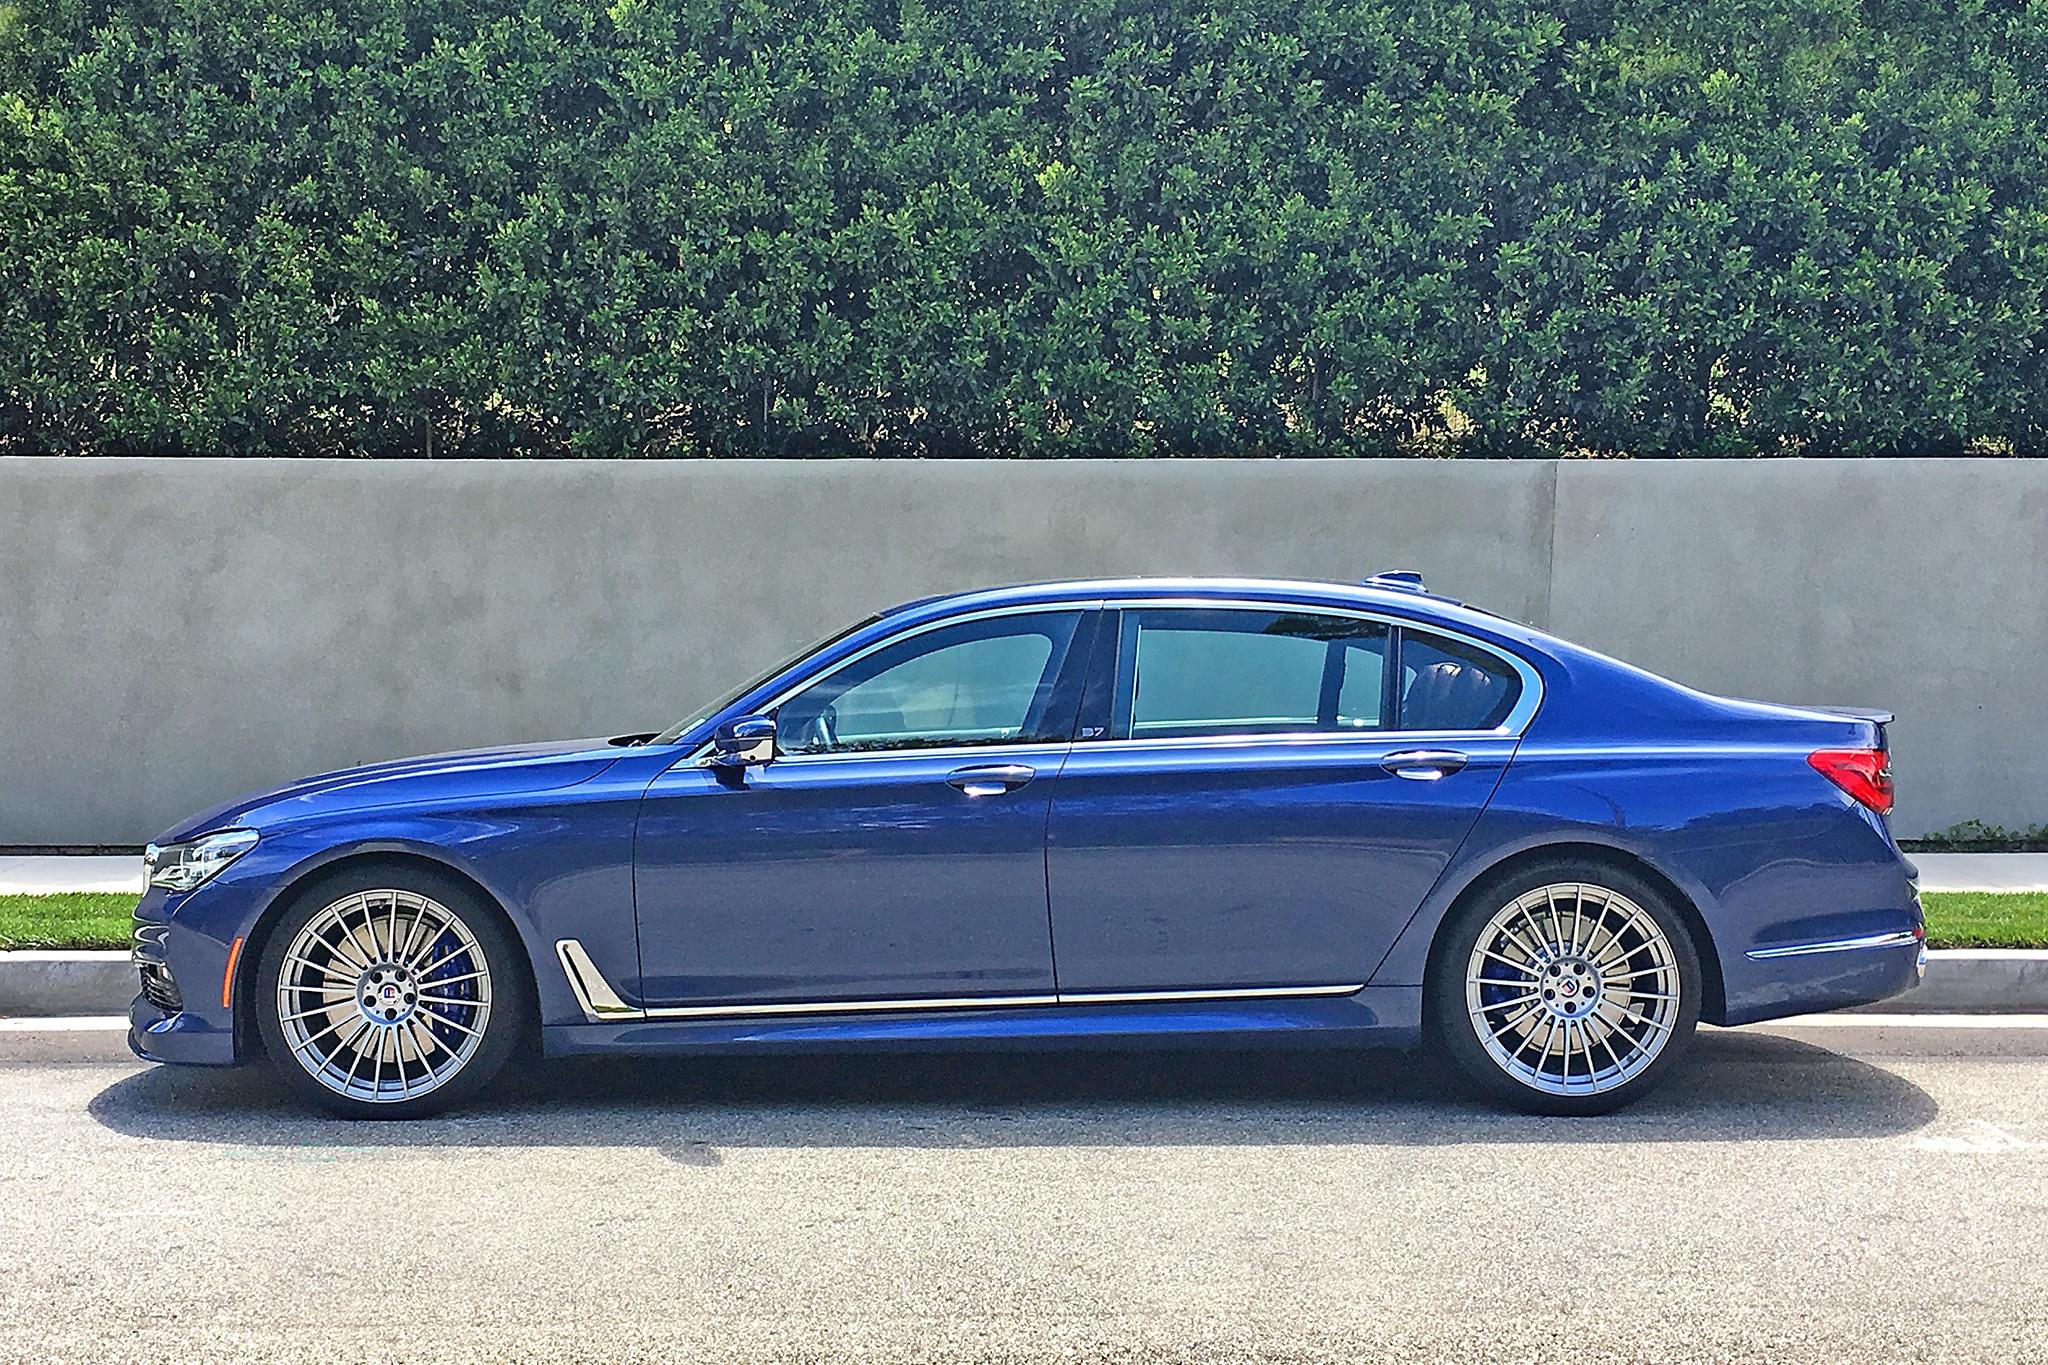 2017 BMW Alpina B7 XDrive Side Profile